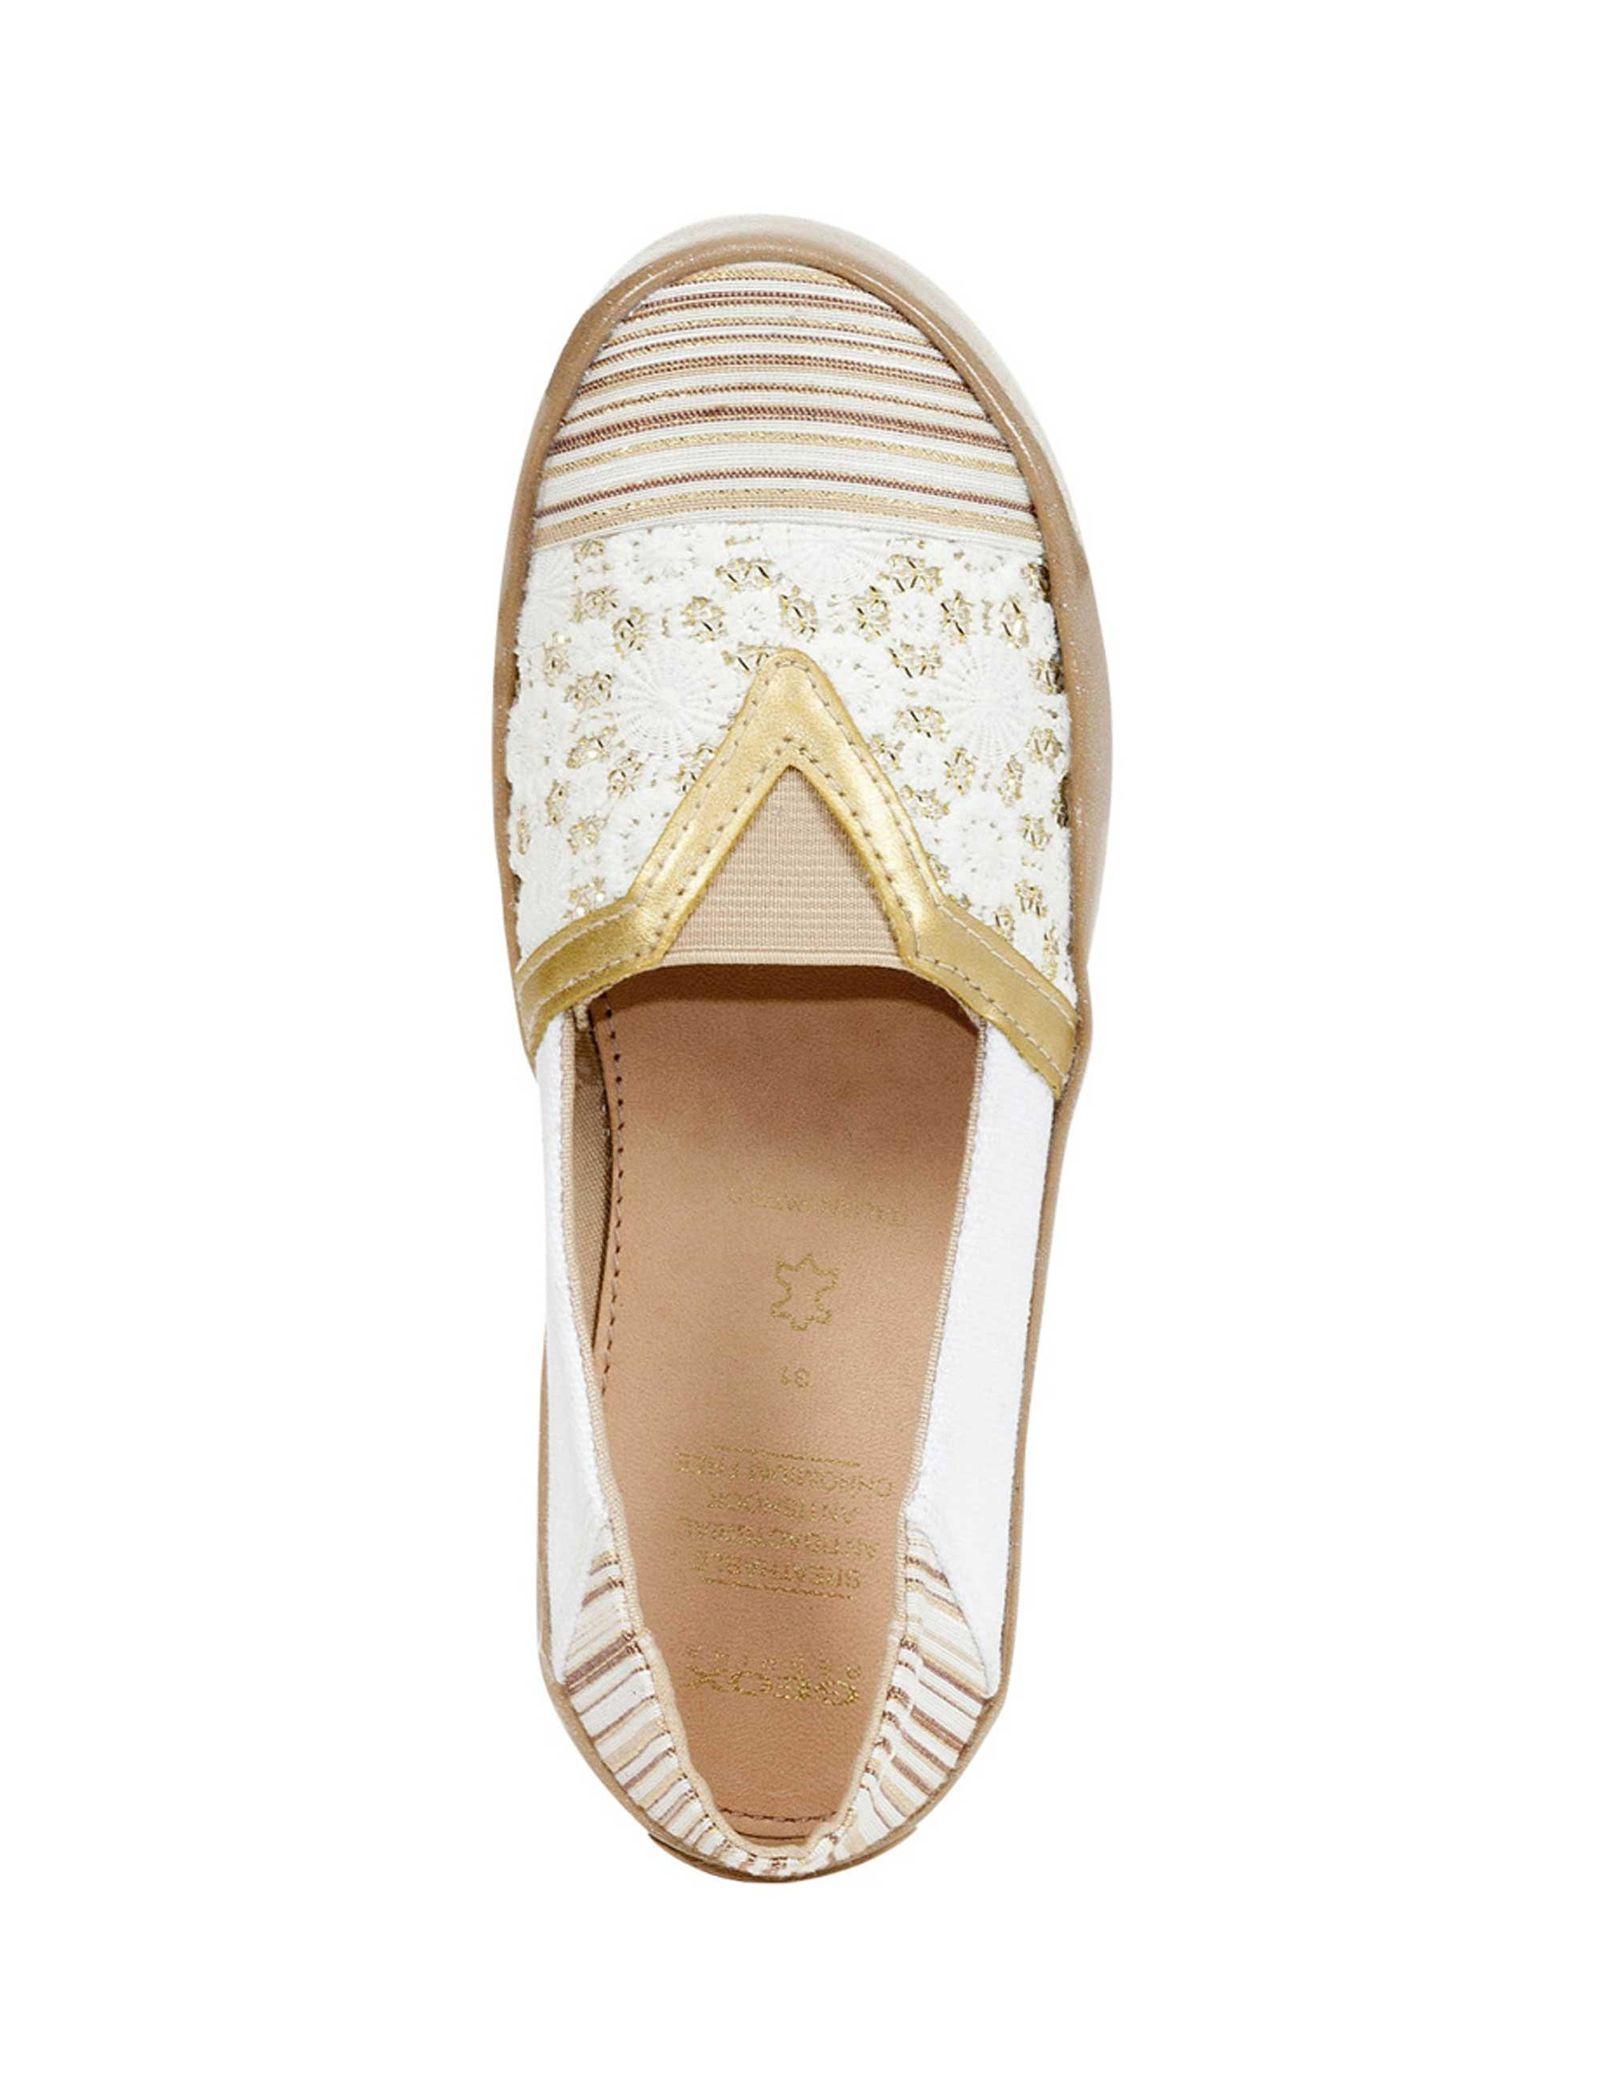 کفش تخت دخترانه JR KILWI - جی اوکس - طلايي - 4